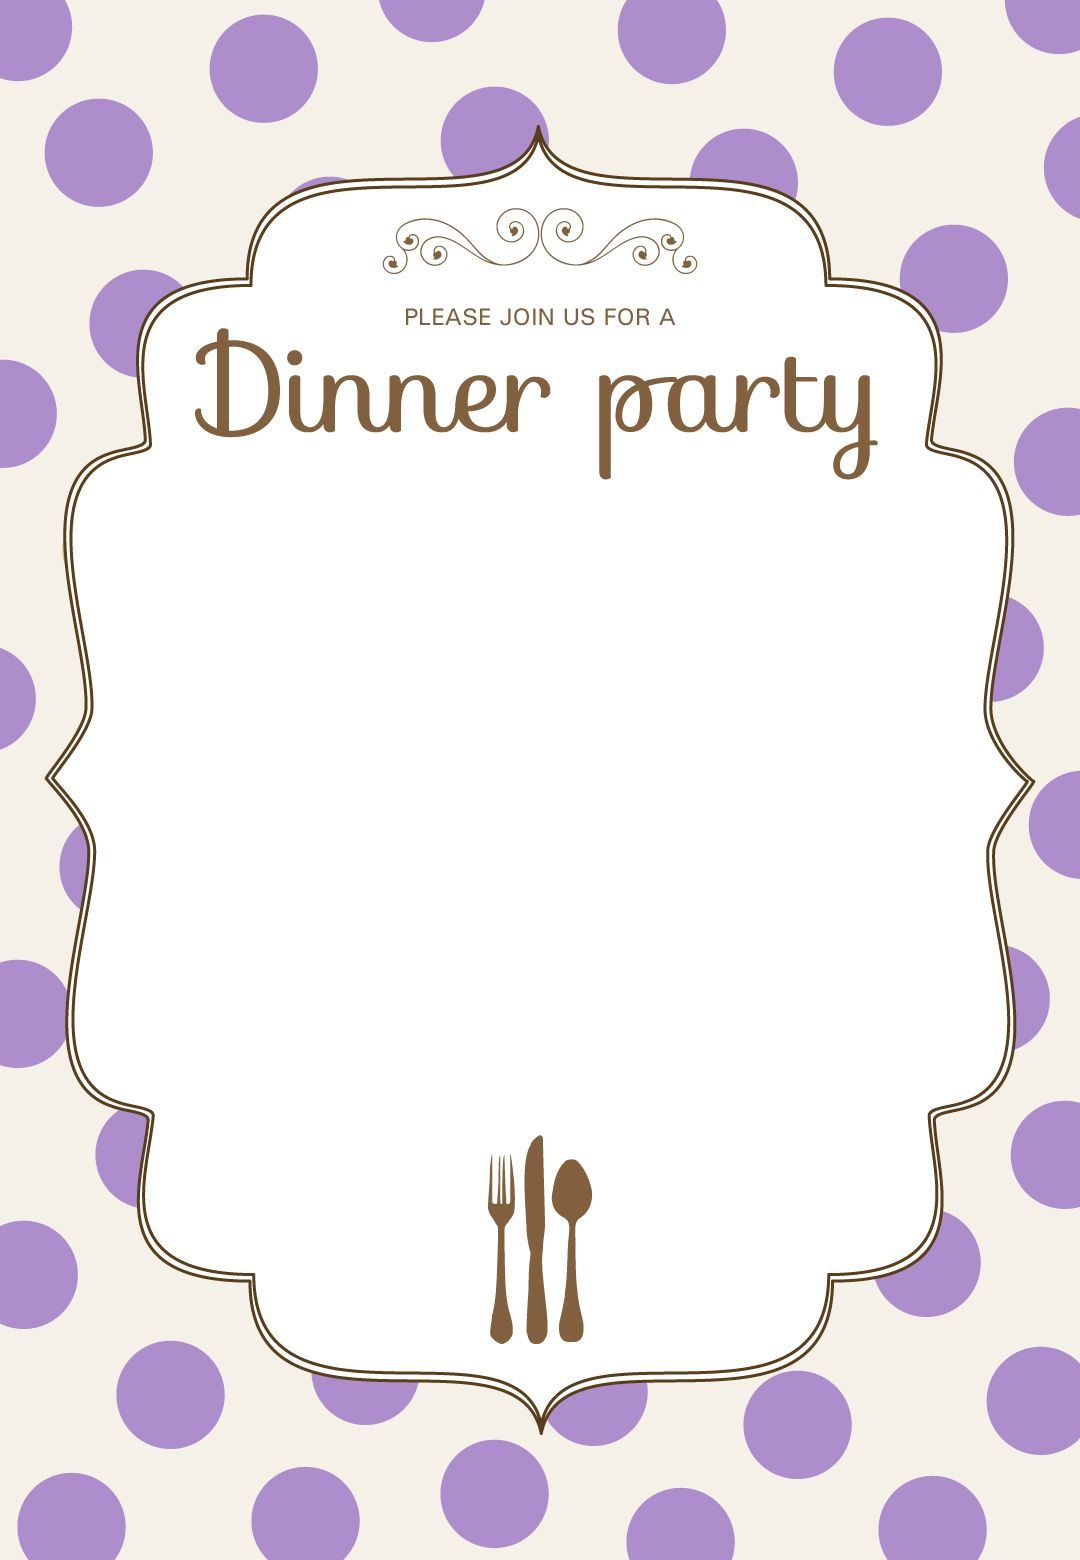 009 Stirring Free Dinner Invitation Template Highest Clarity  Templates Rehearsal Printable Italian ThanksgivingFull